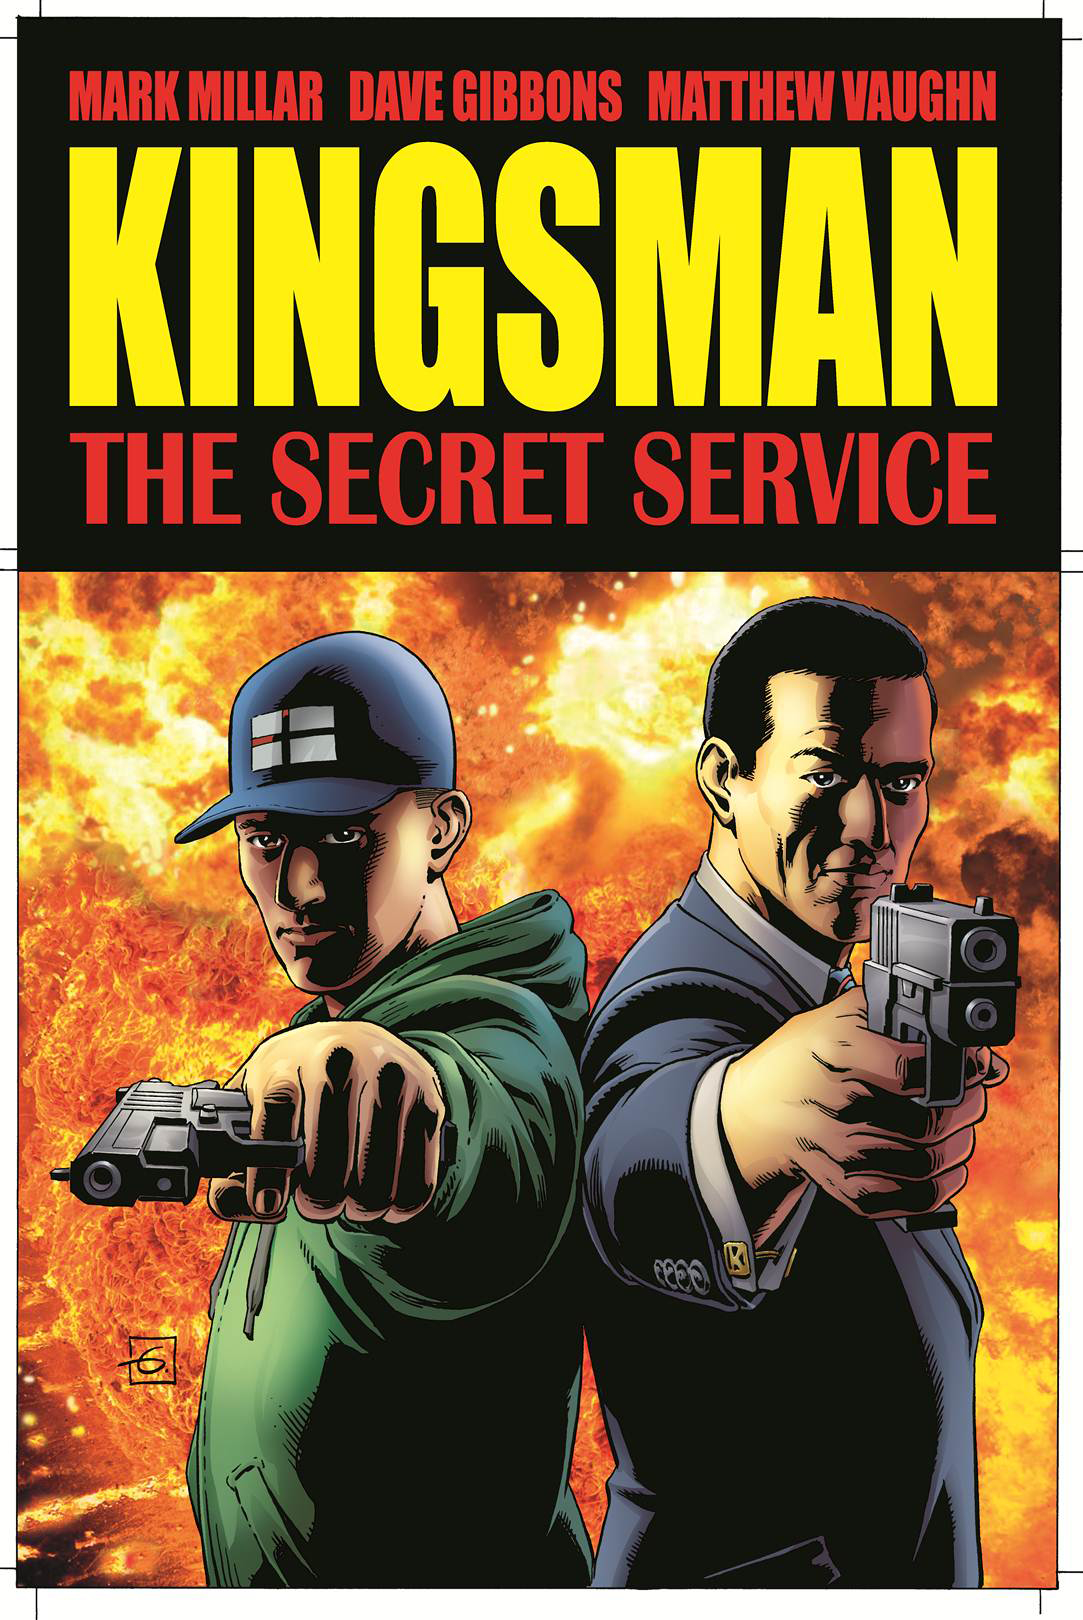 Comic book the secret service